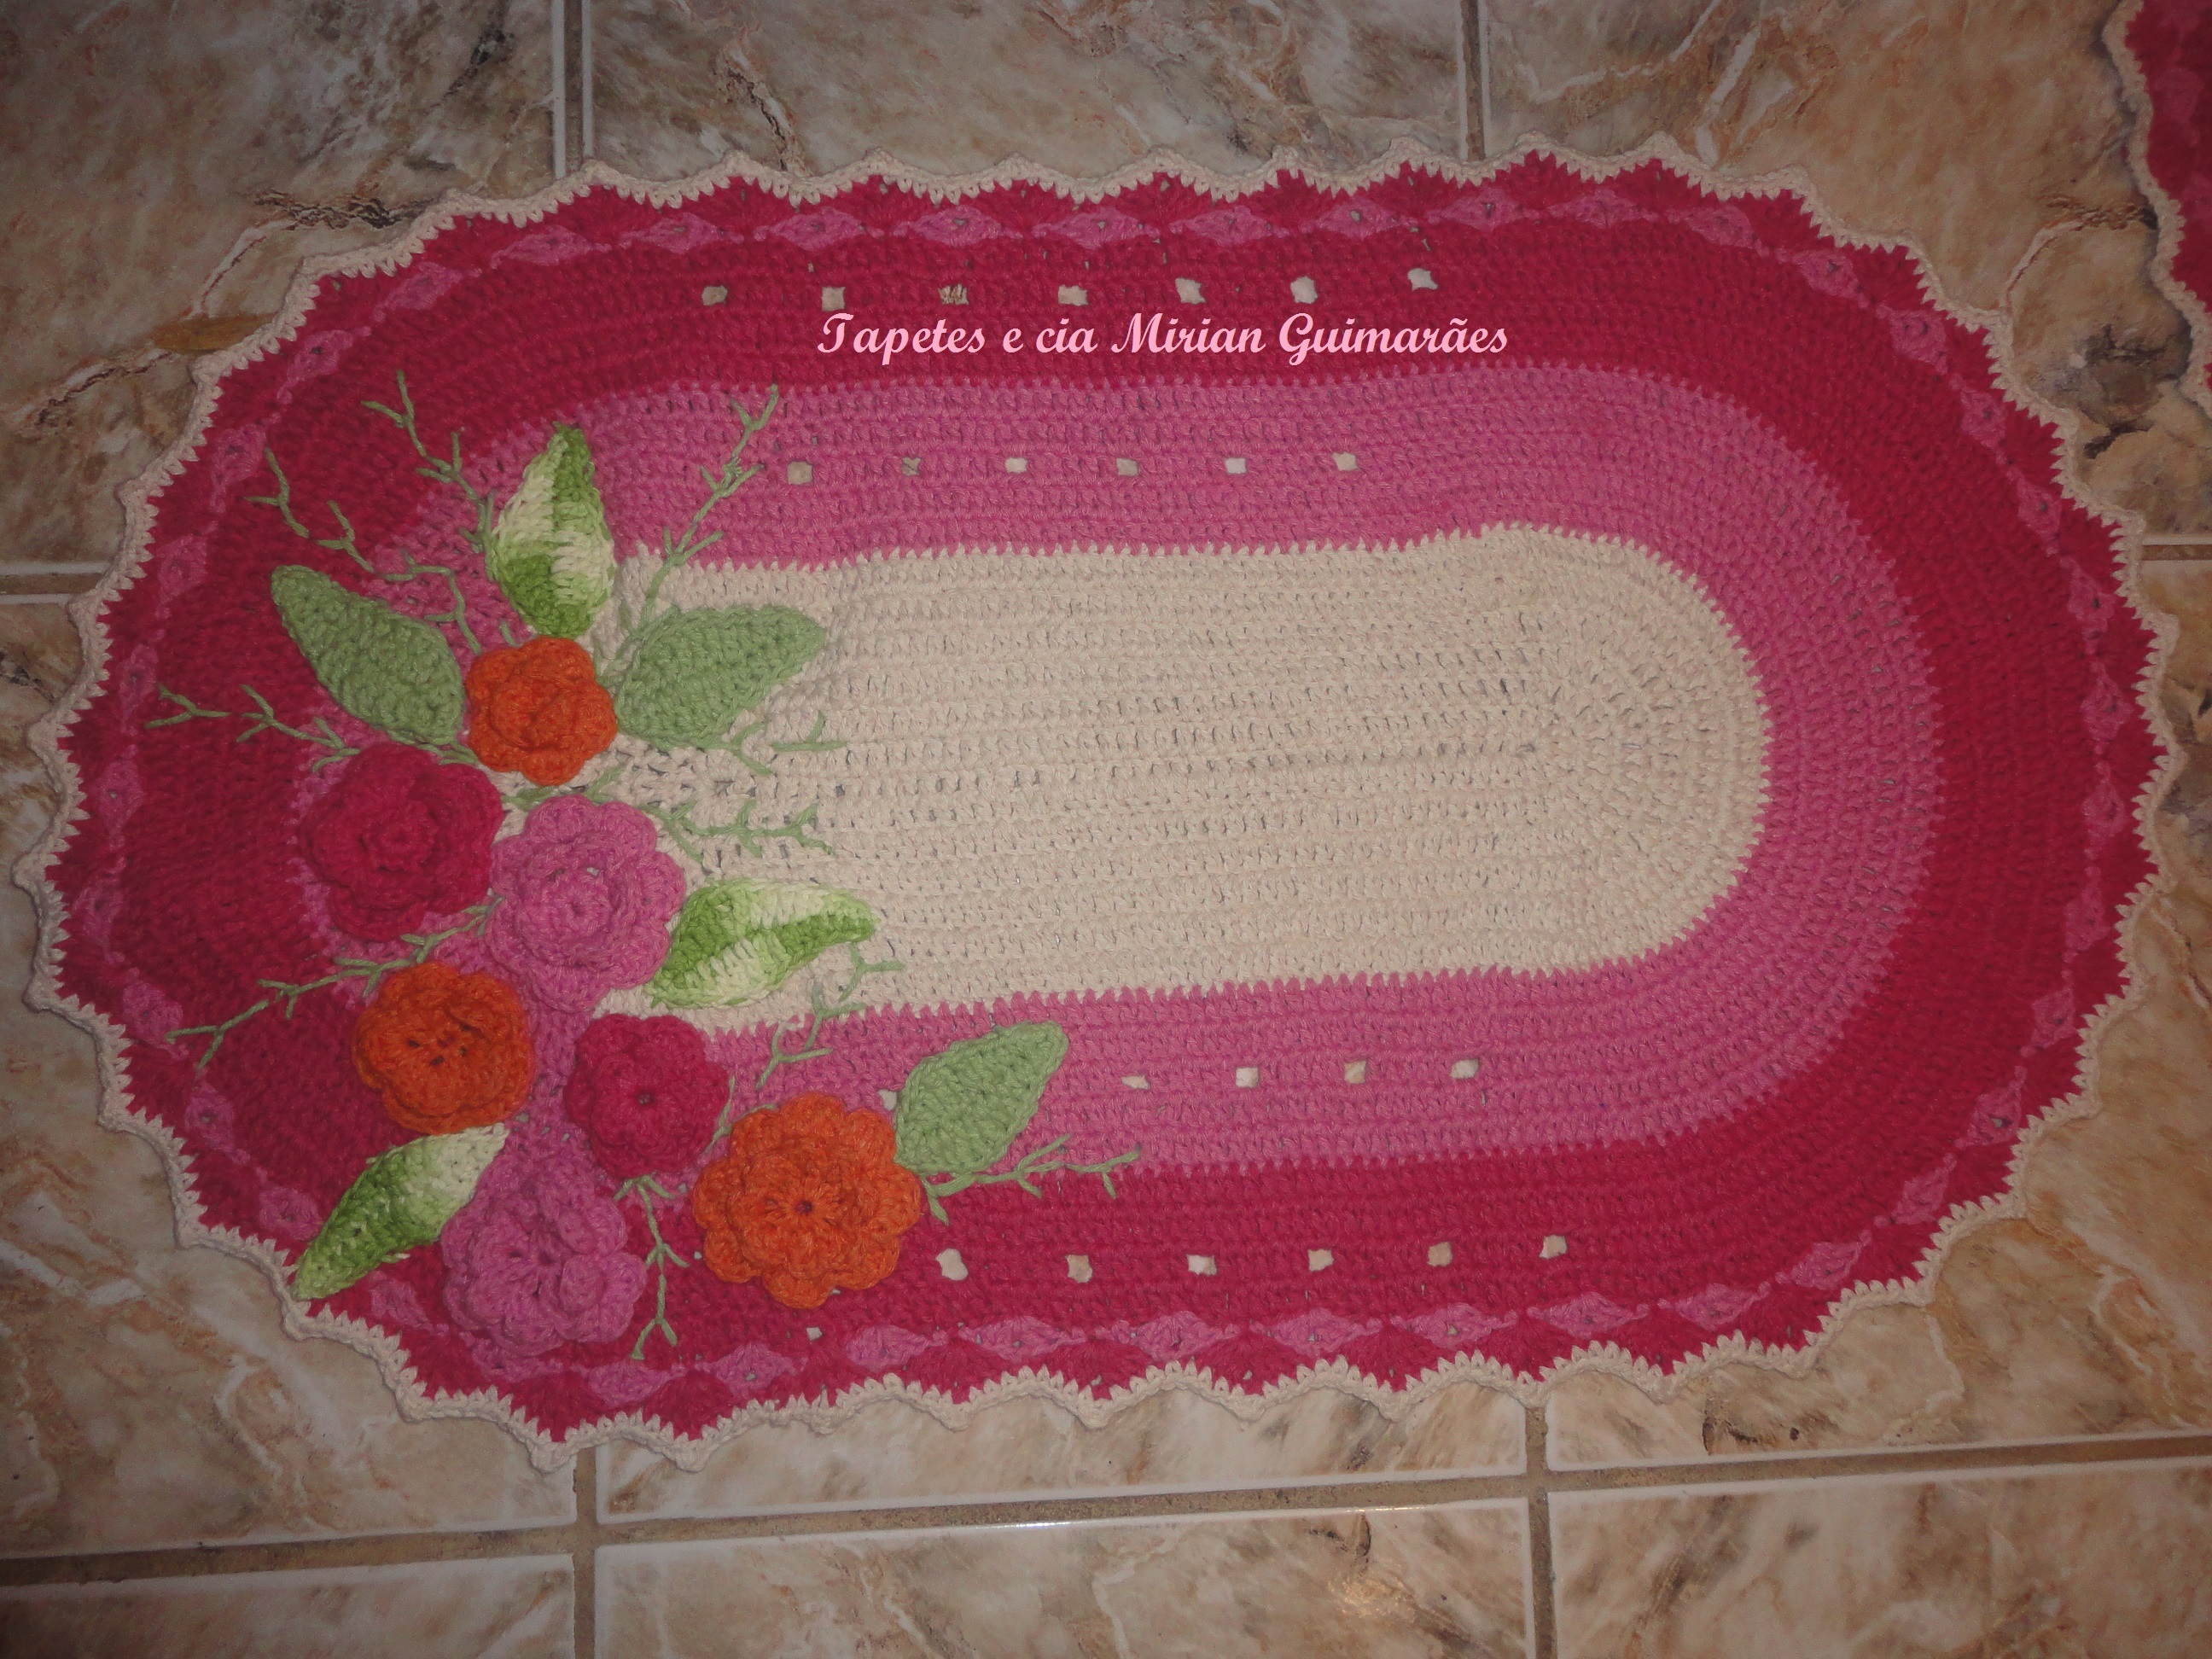 tapete rosa jardim encantado  Tapetes e cia Mirian Guimarães  Elo7